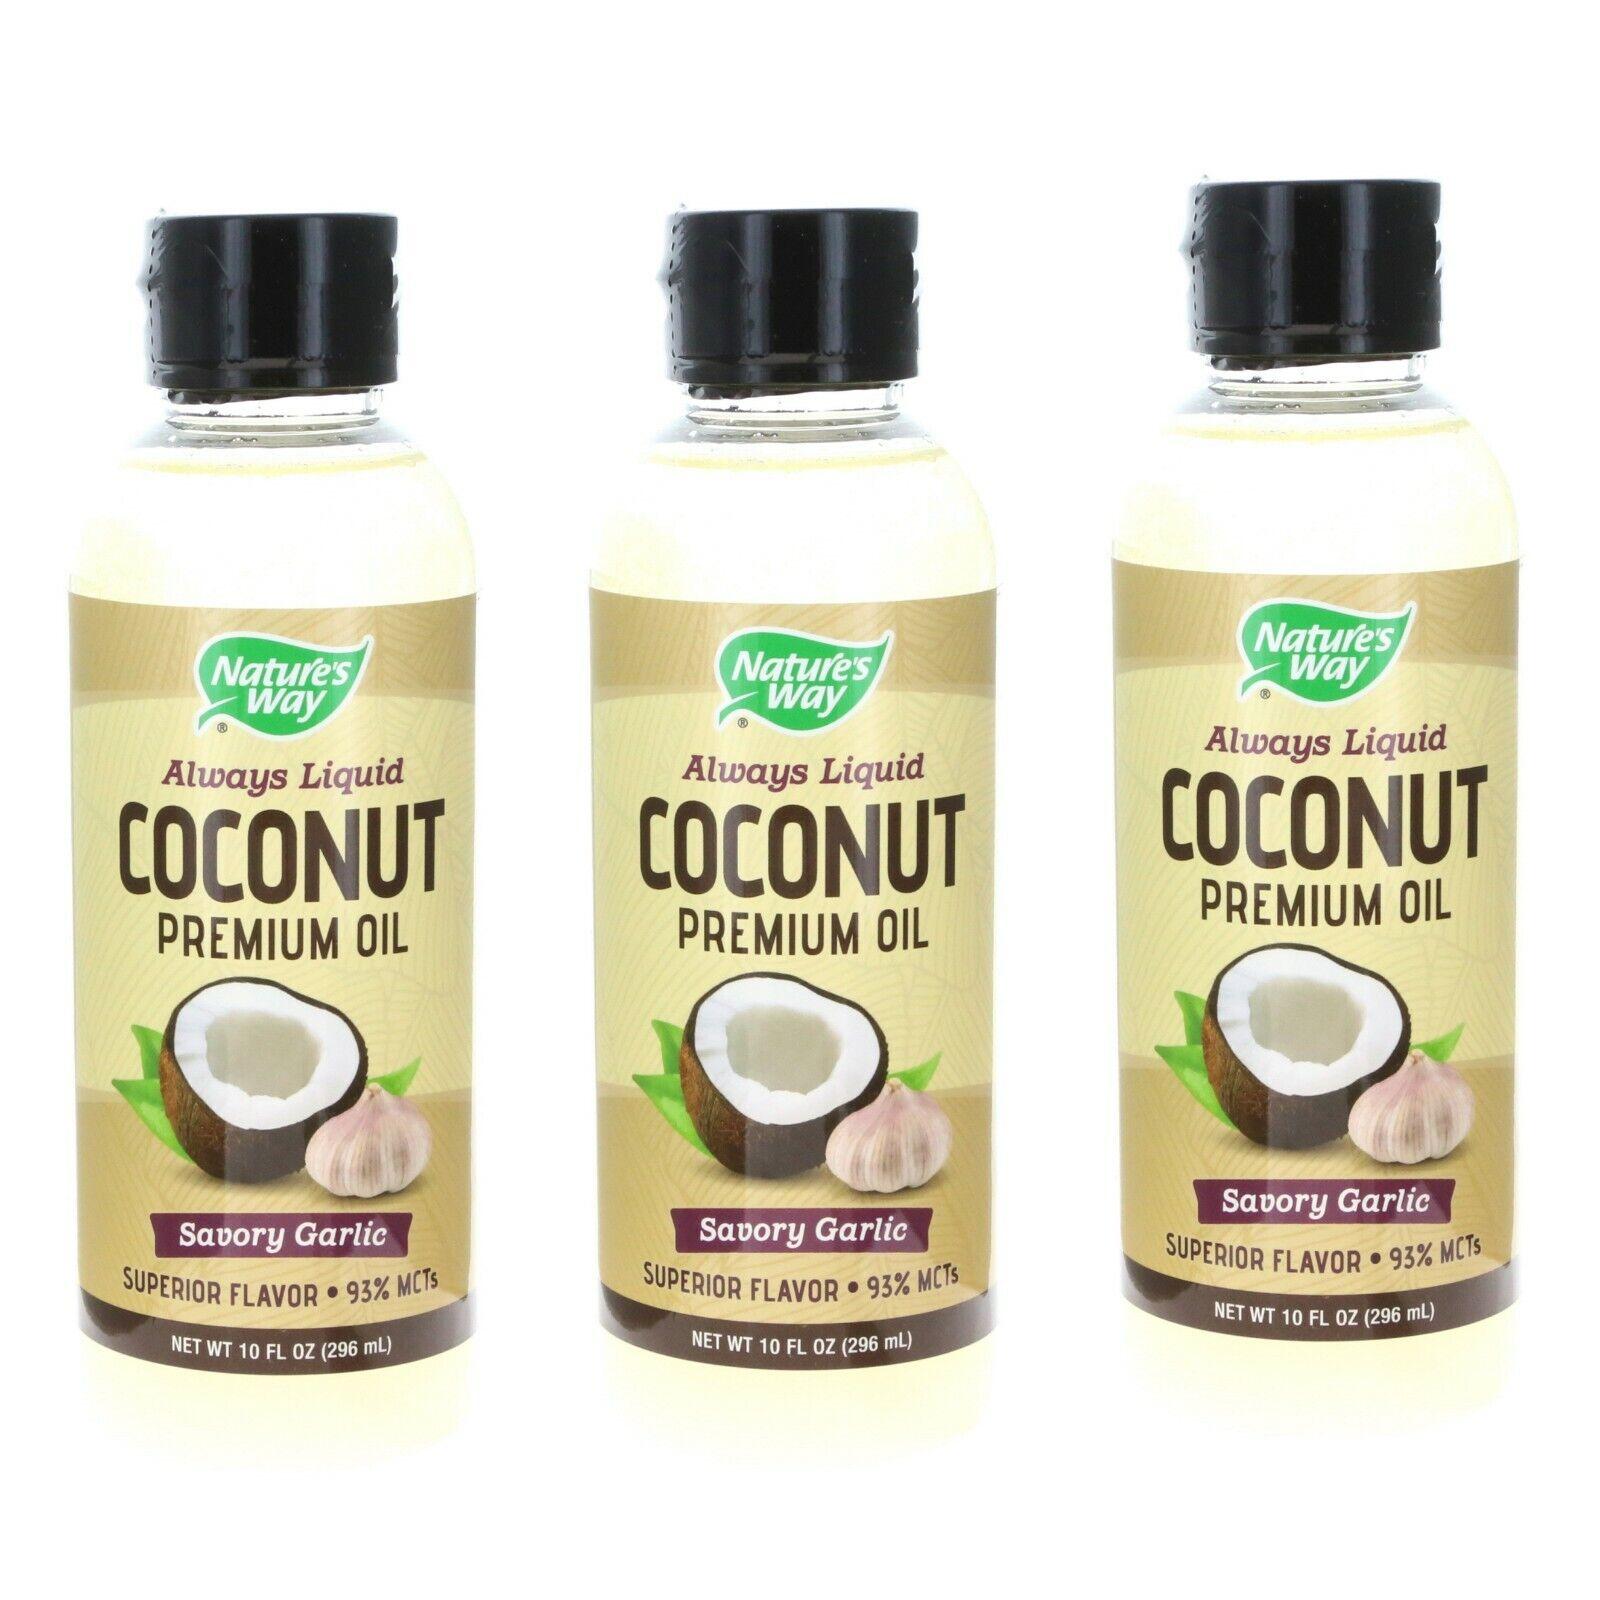 Coconut Premium Oil Savory Garlic Nature's Way 10 fl oz Oil